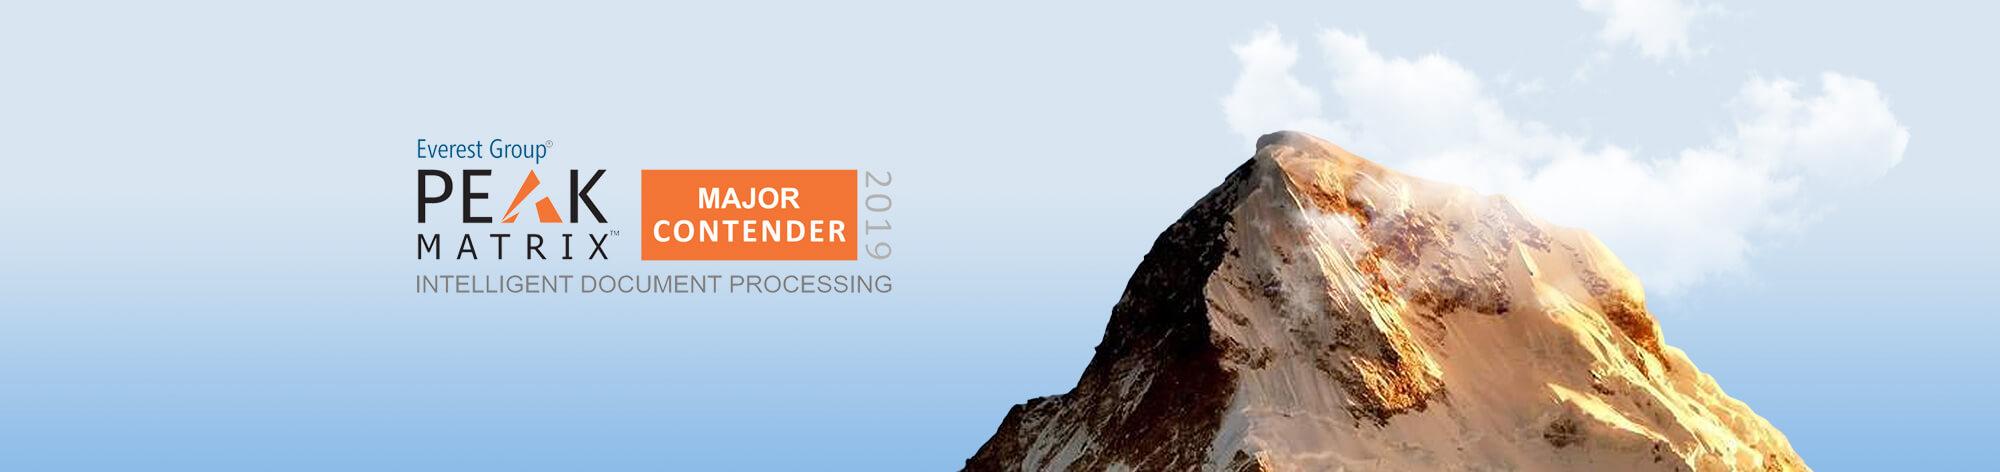 Insurance Business Process Management (BPM ) Solution